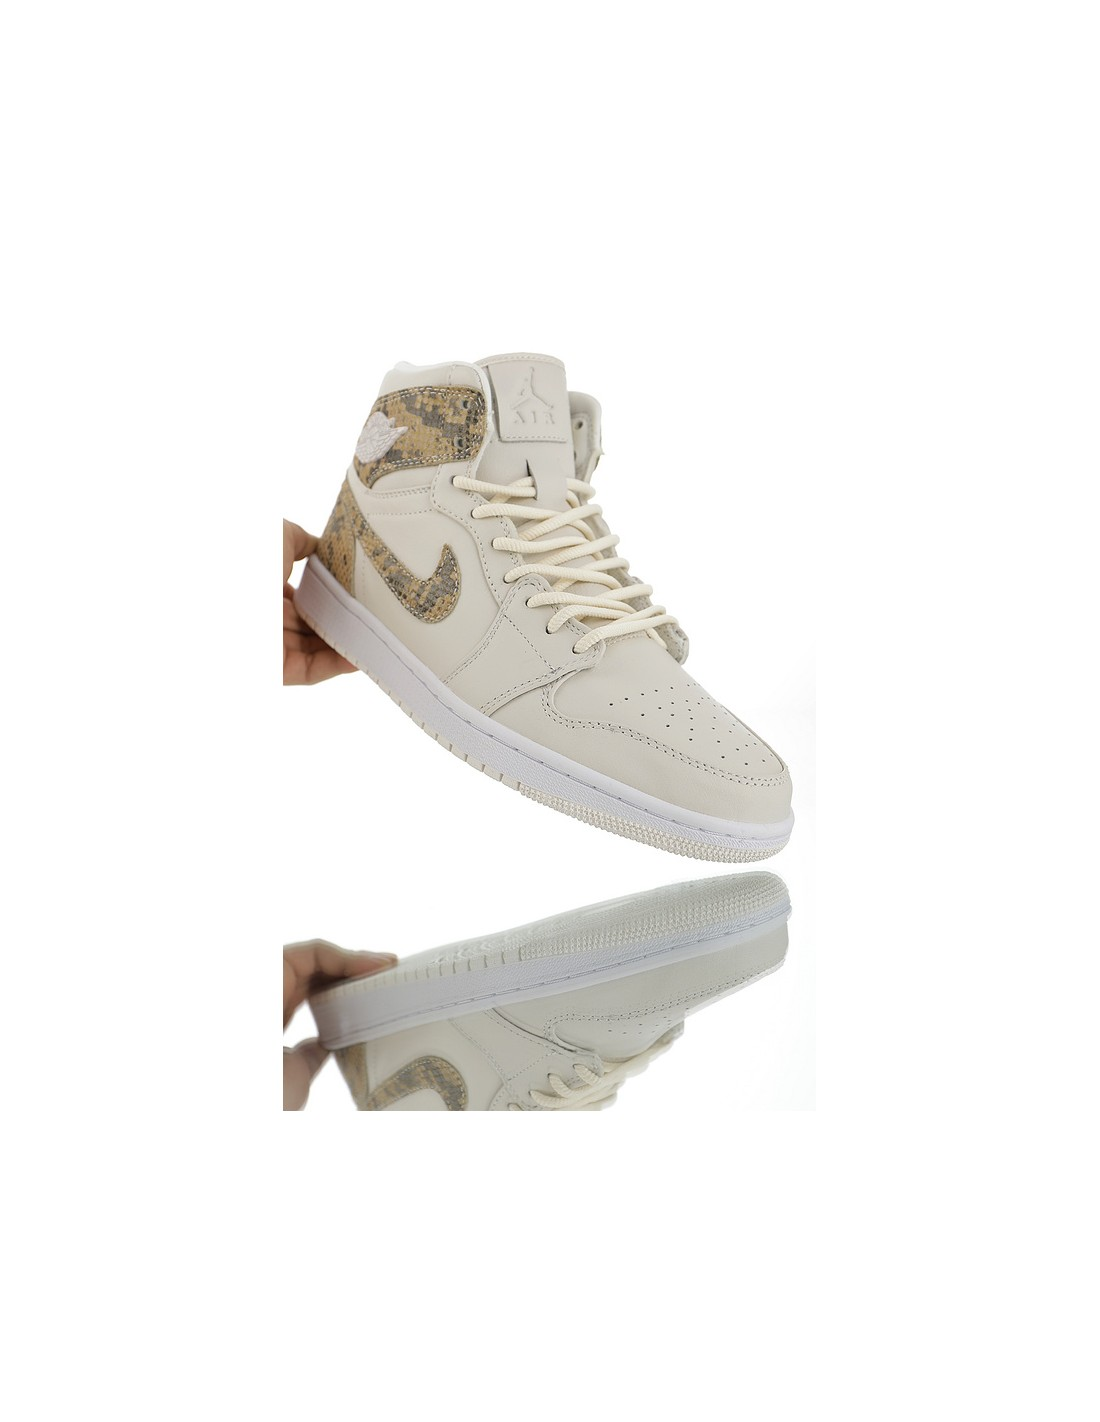 80439e1ae1ea Air Jordan 1 High Premium Men s Shoe